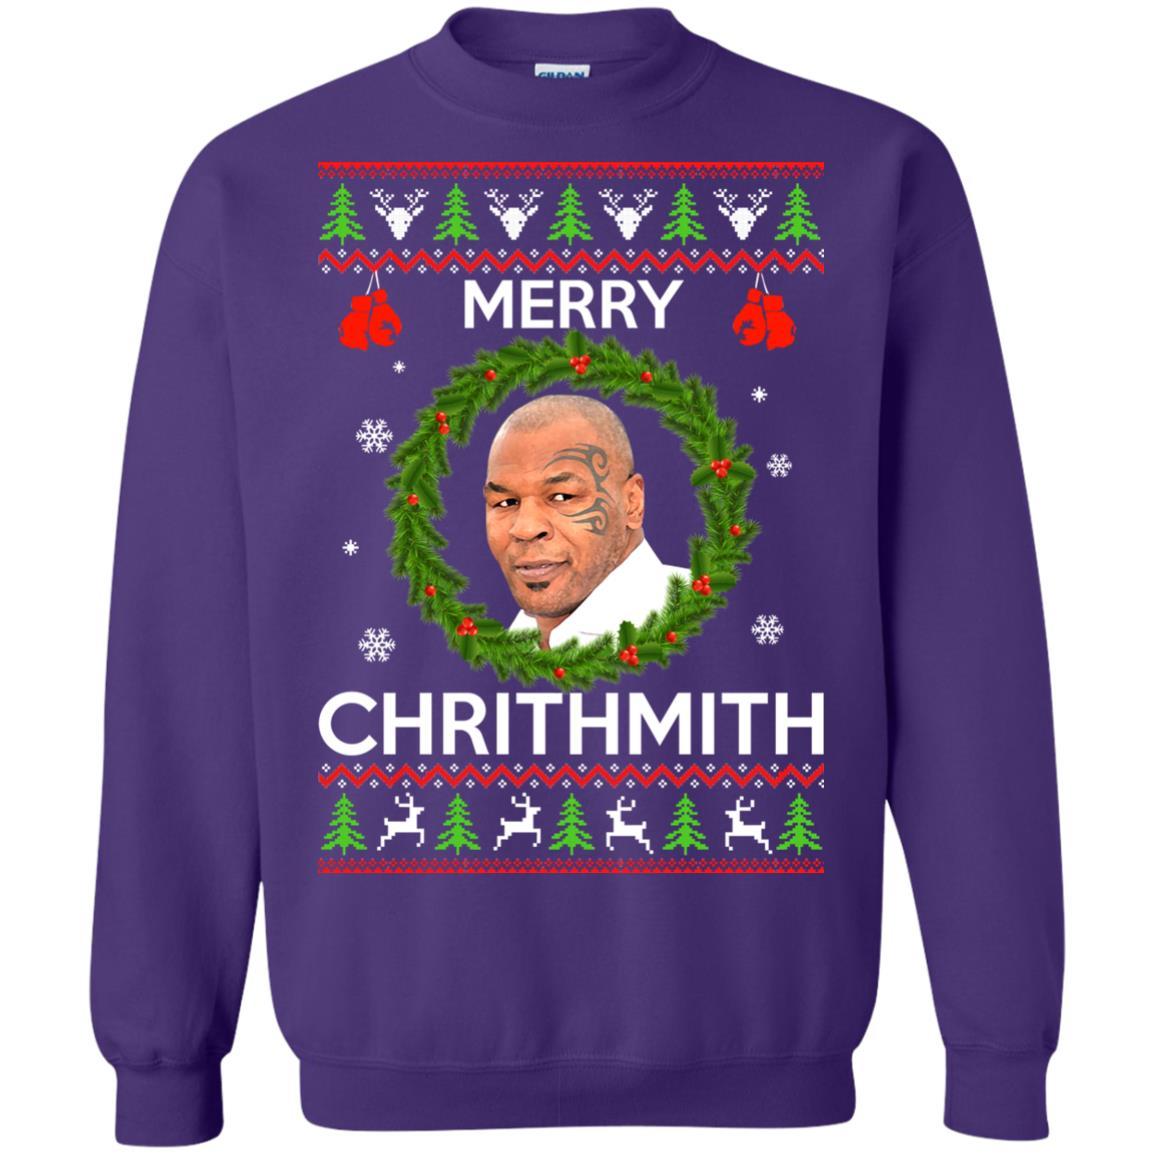 image 847px Mike Tyson Christmas Sweater Merry Chrithmith Sweatshirt